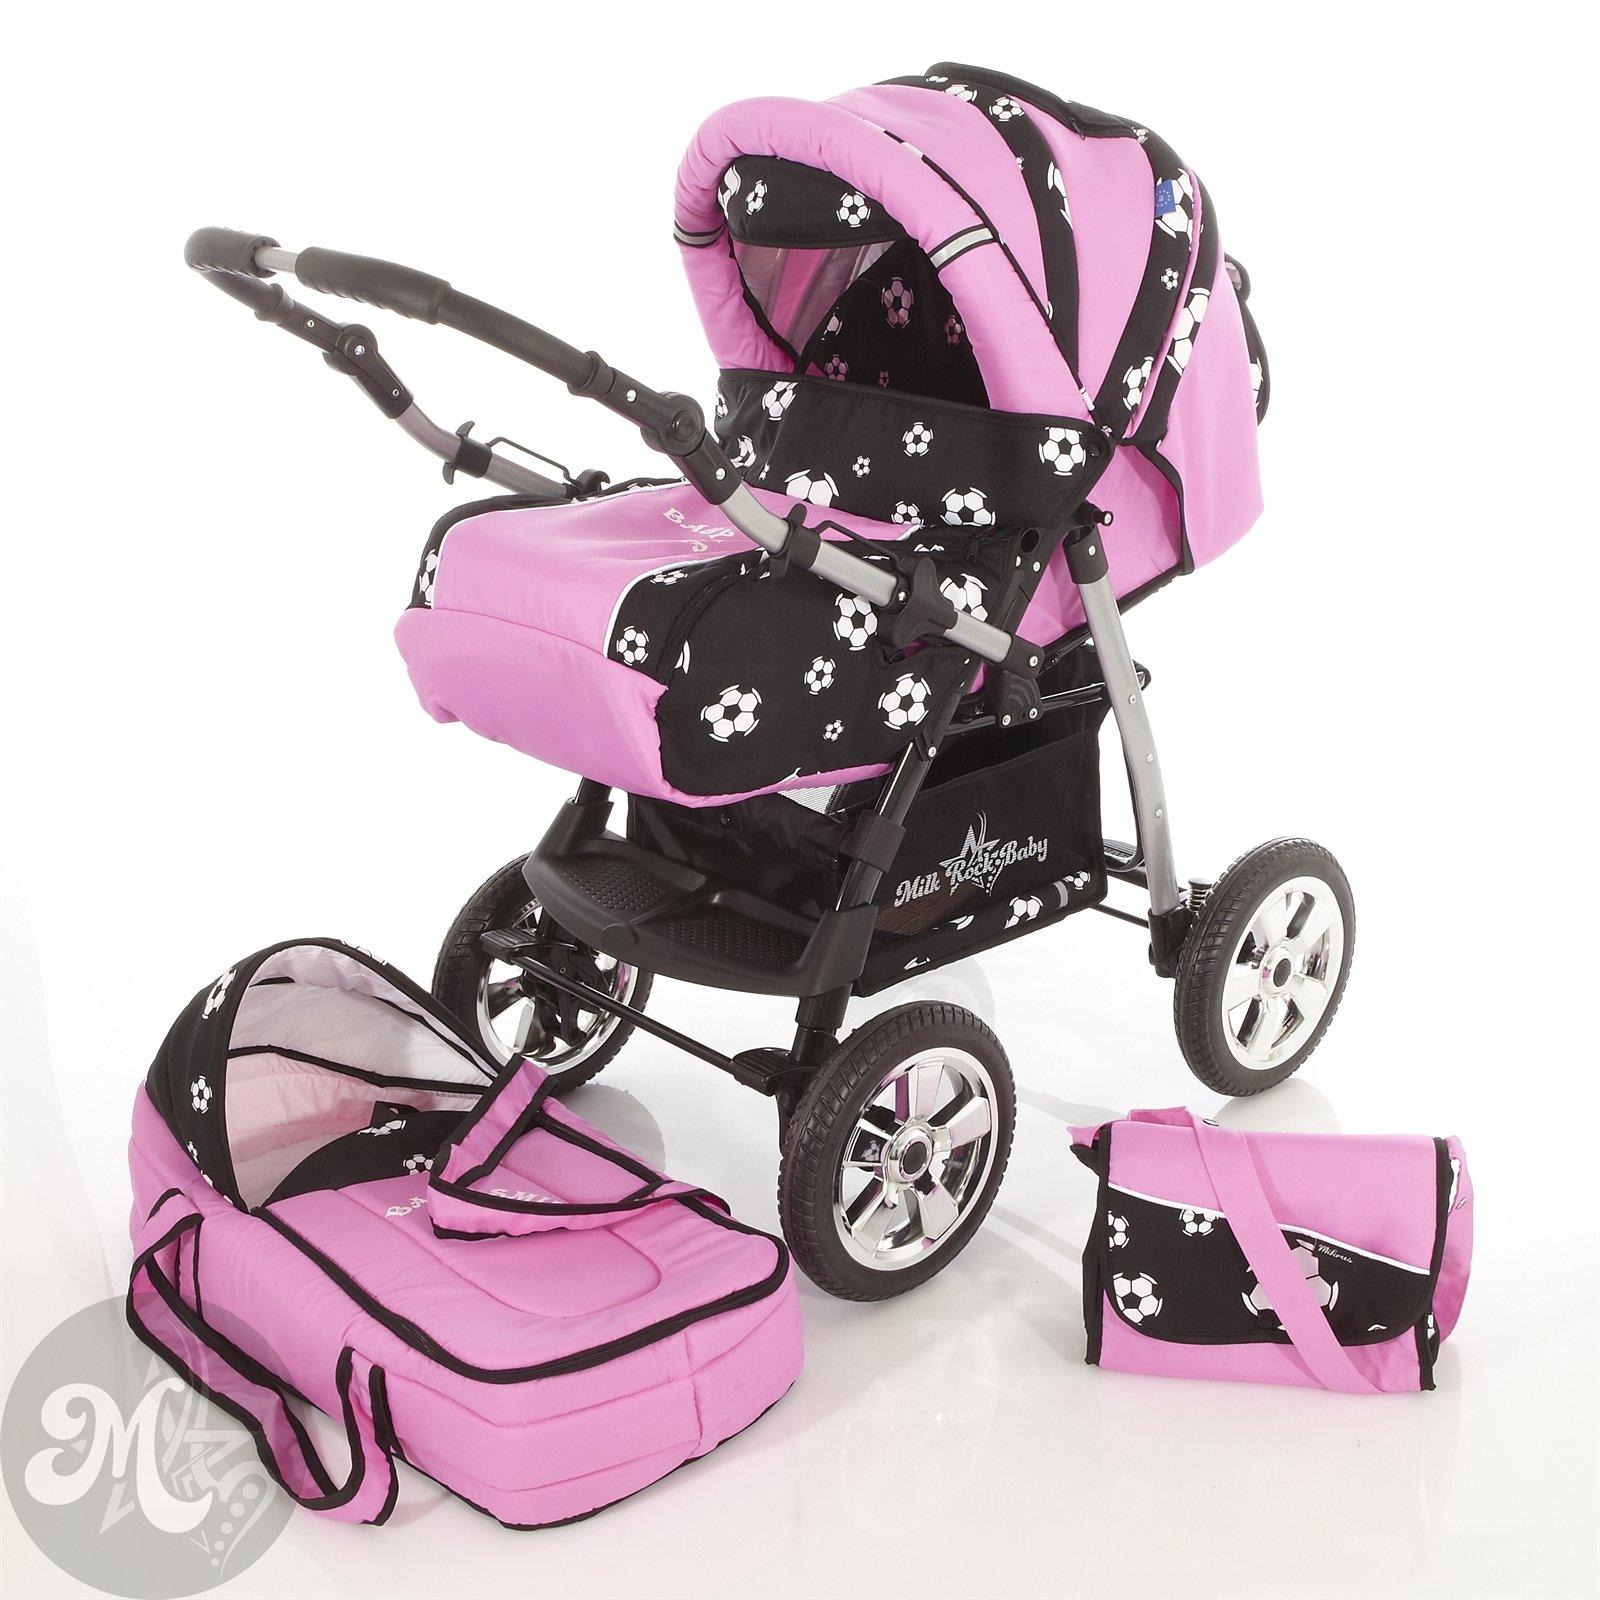 Milk Rock Baby Star Cruiser 2 in 1 Pram Combi Stroller & Pushchair (rain cover, mosquito net, 30 colors) 27 Rose Soccer